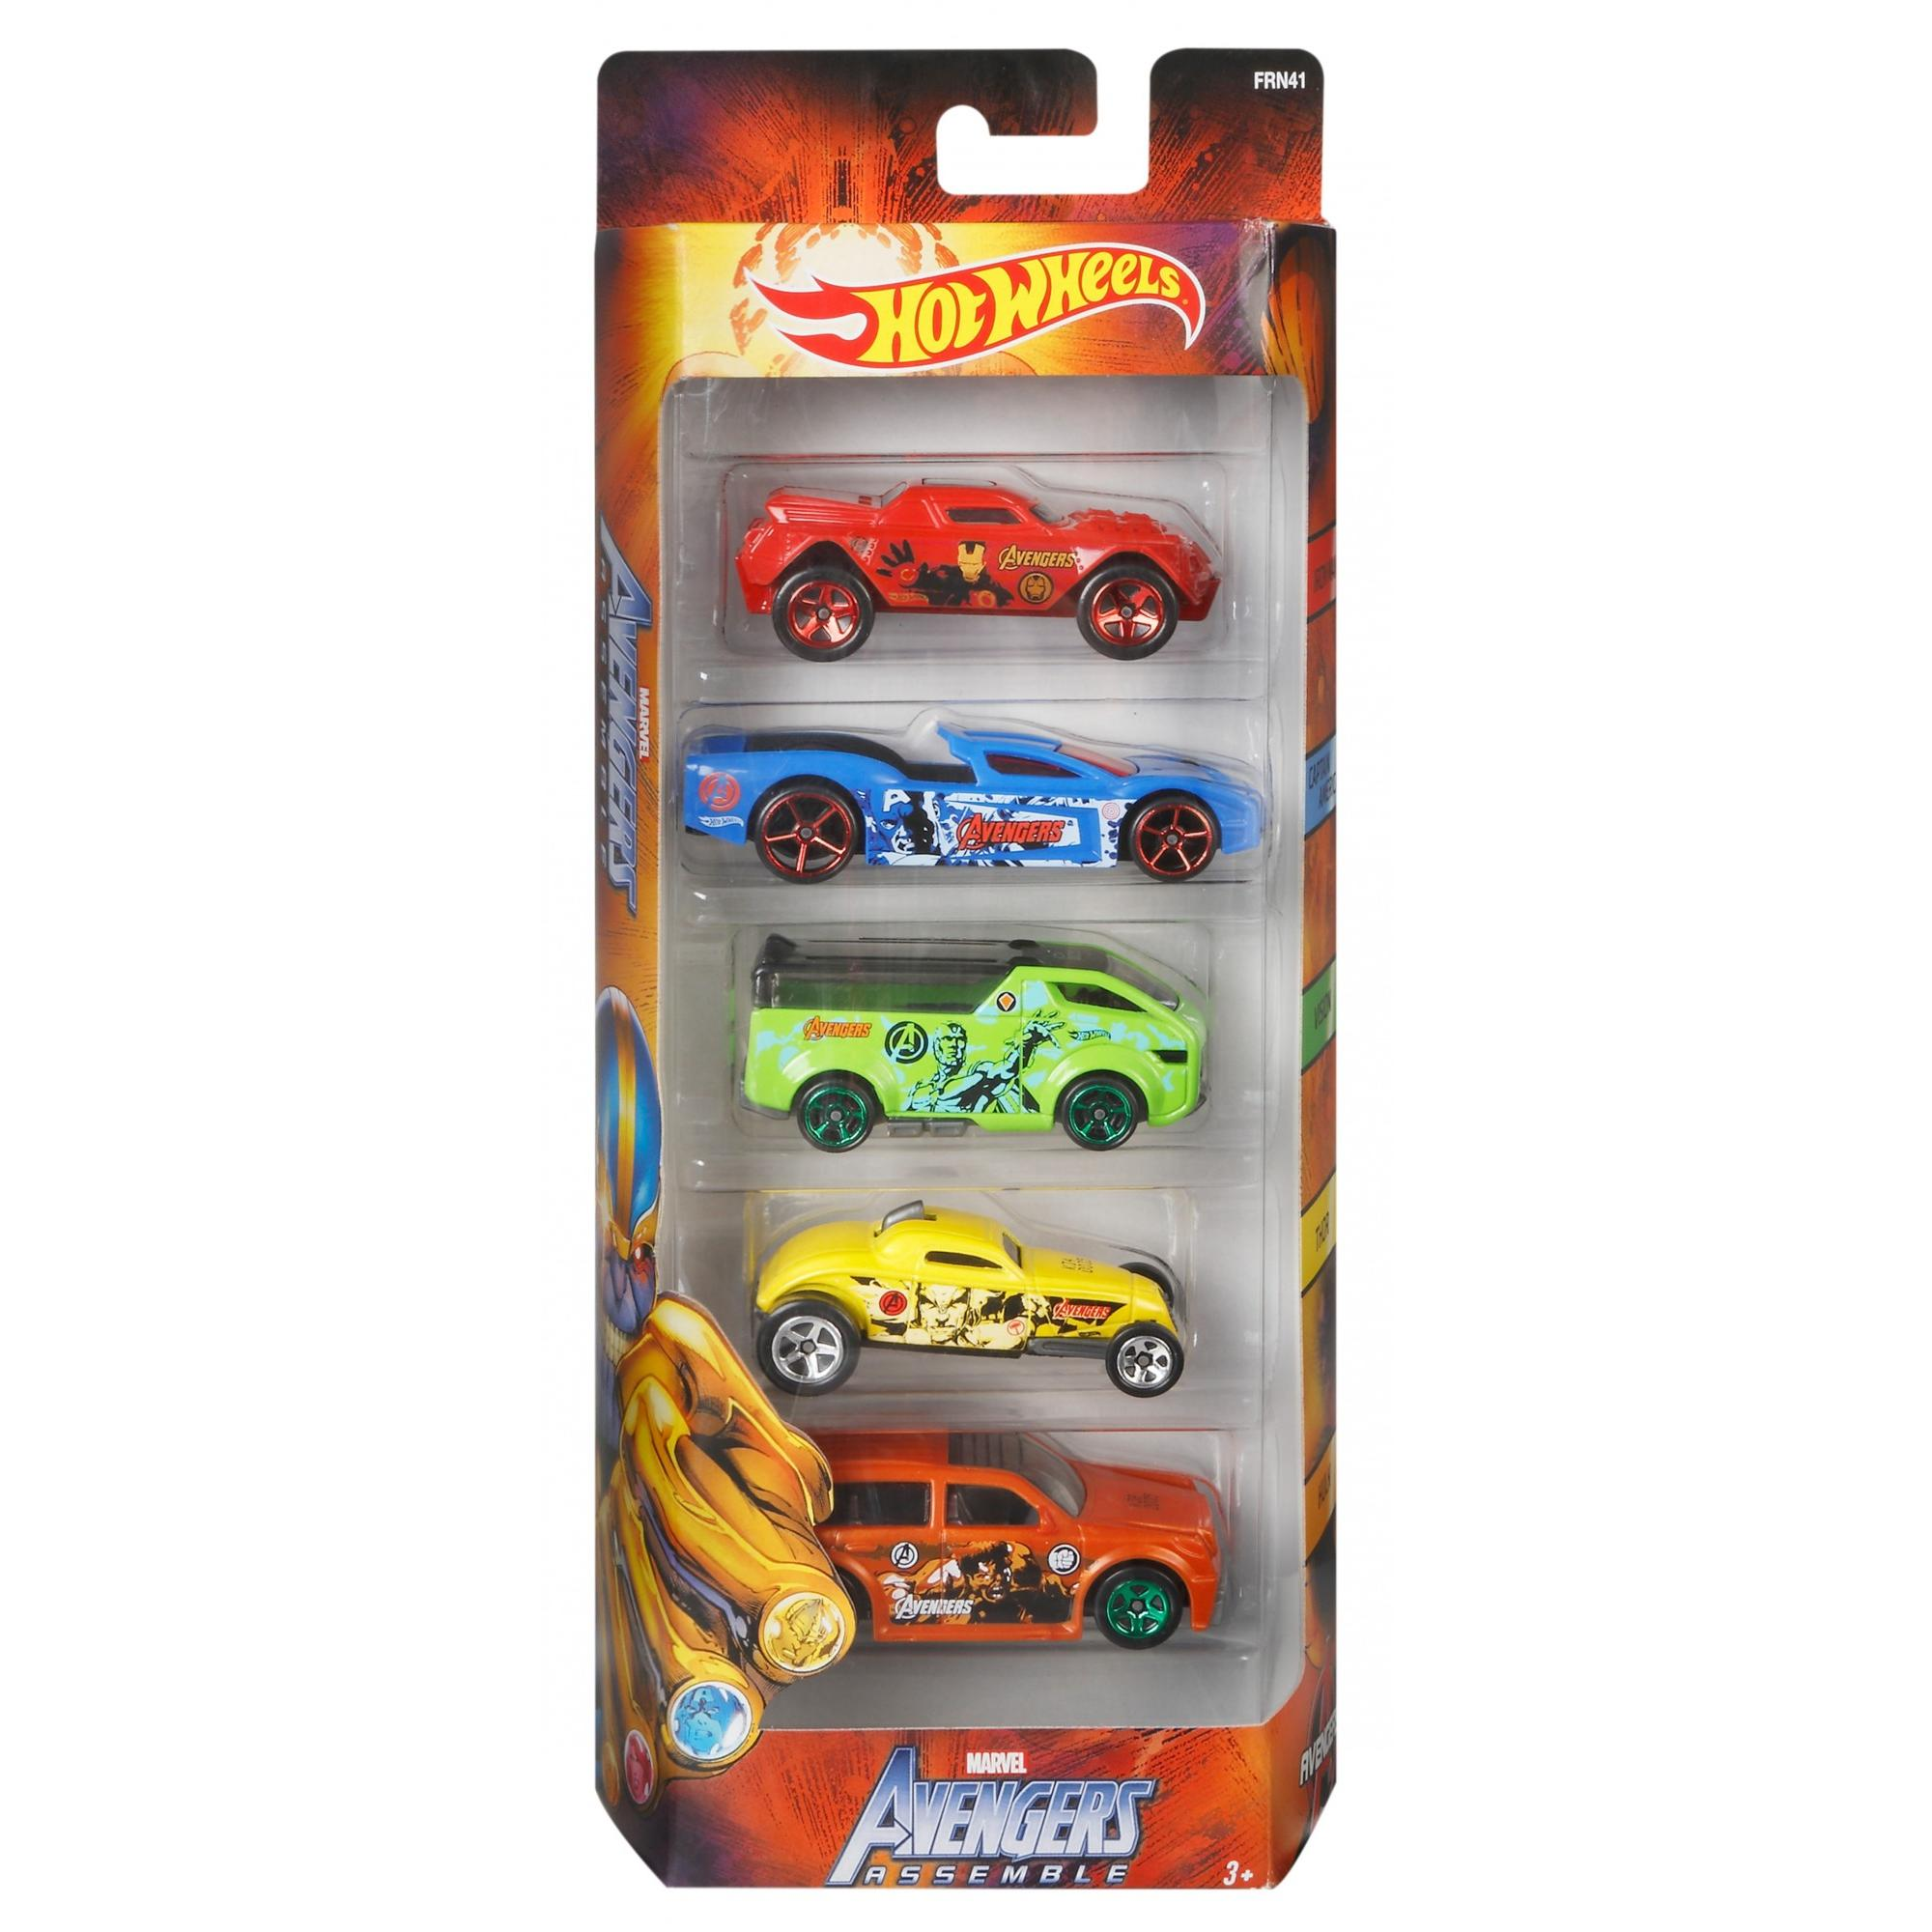 Hot Wheels Marvel Avengers Vehicle 5-Pack by Mattel